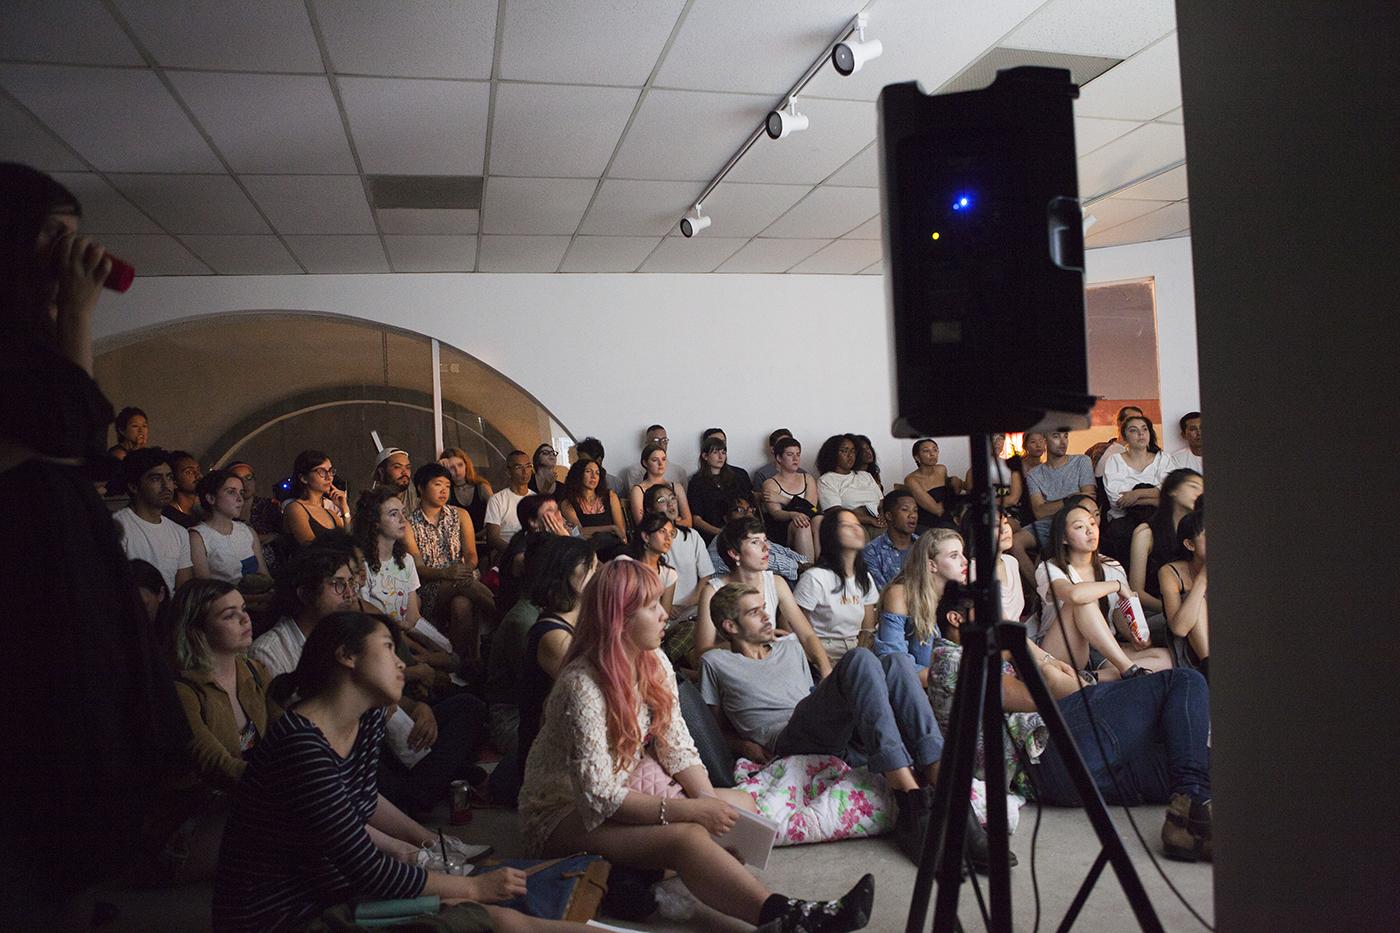 first screening at los angeles contemporary archive (laca). image credit: sarah waldorf